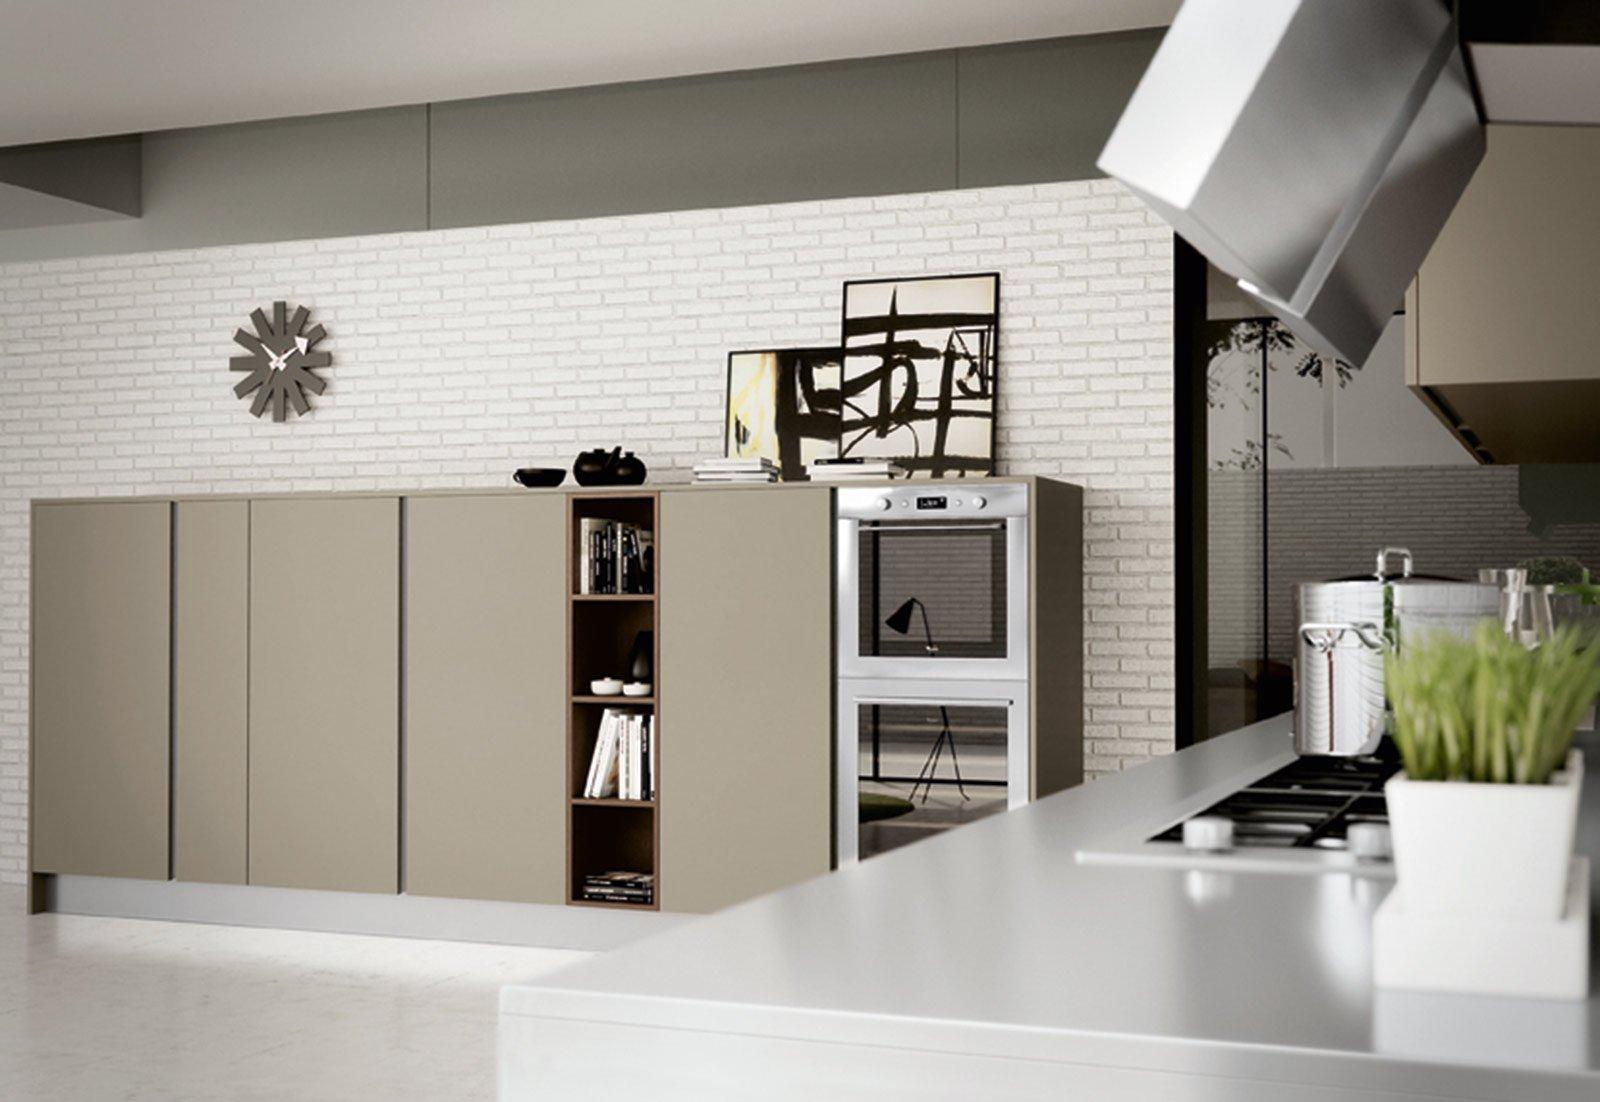 Stunning Cucine Moderne Piccoli Spazi Pictures - Design & Ideas ...